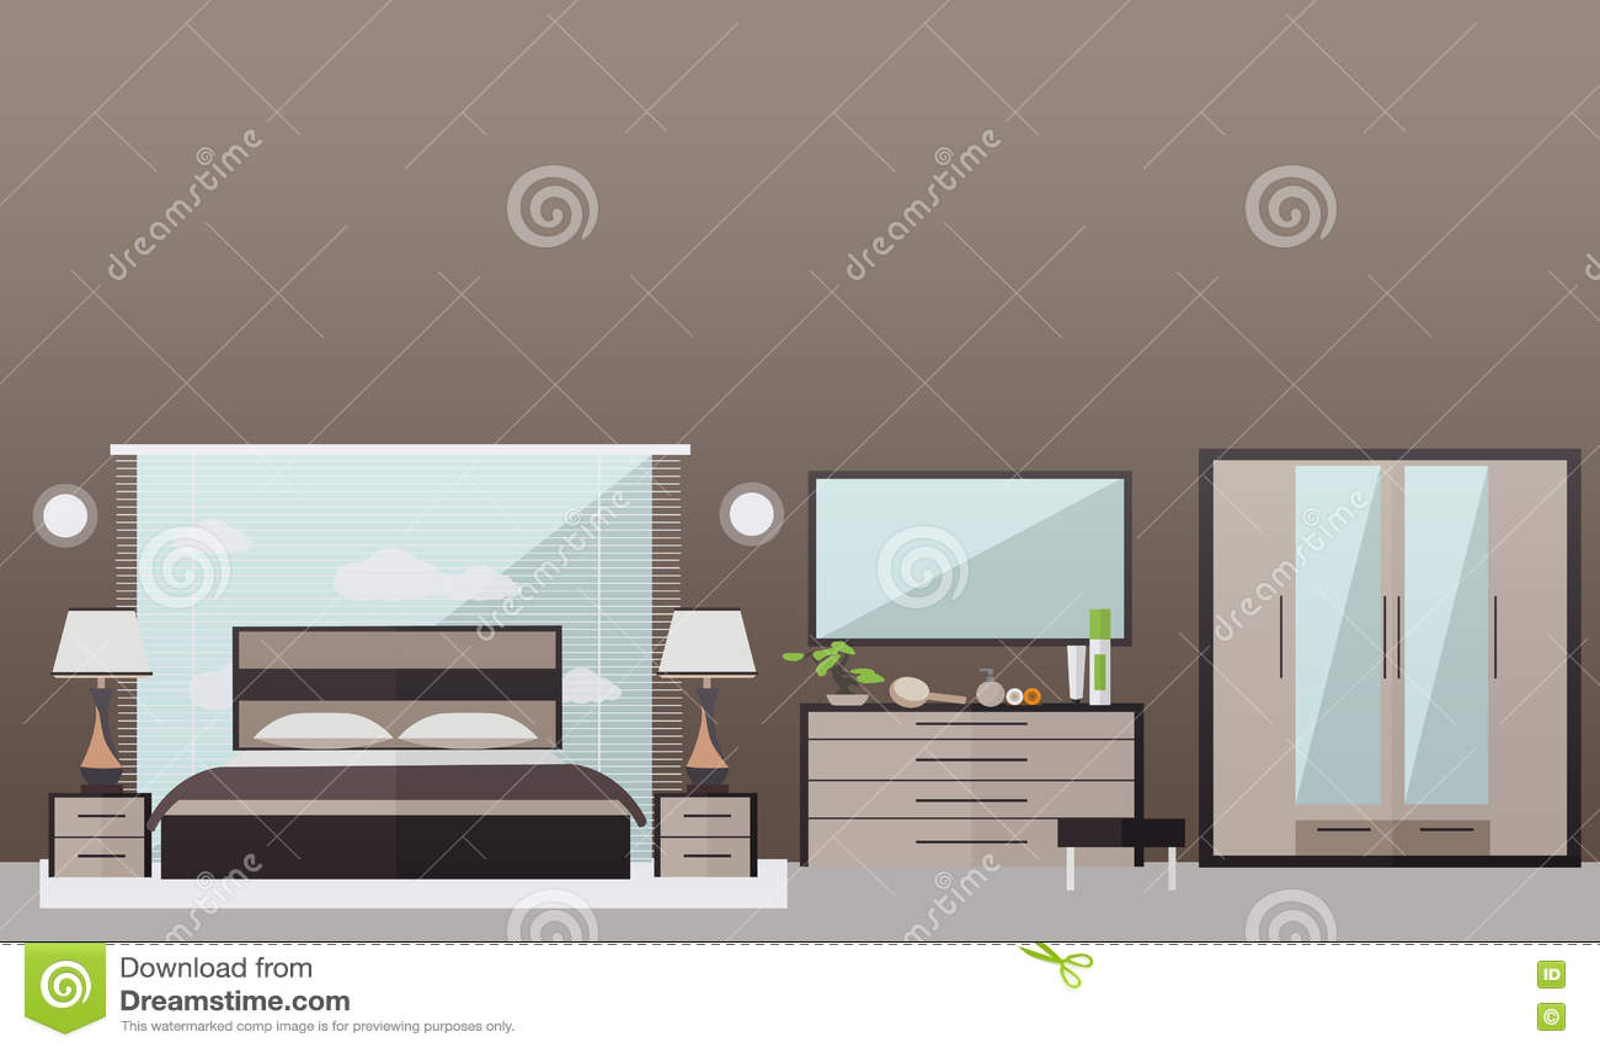 Bedroom Interior In Flat Style Vector Illustration Stock